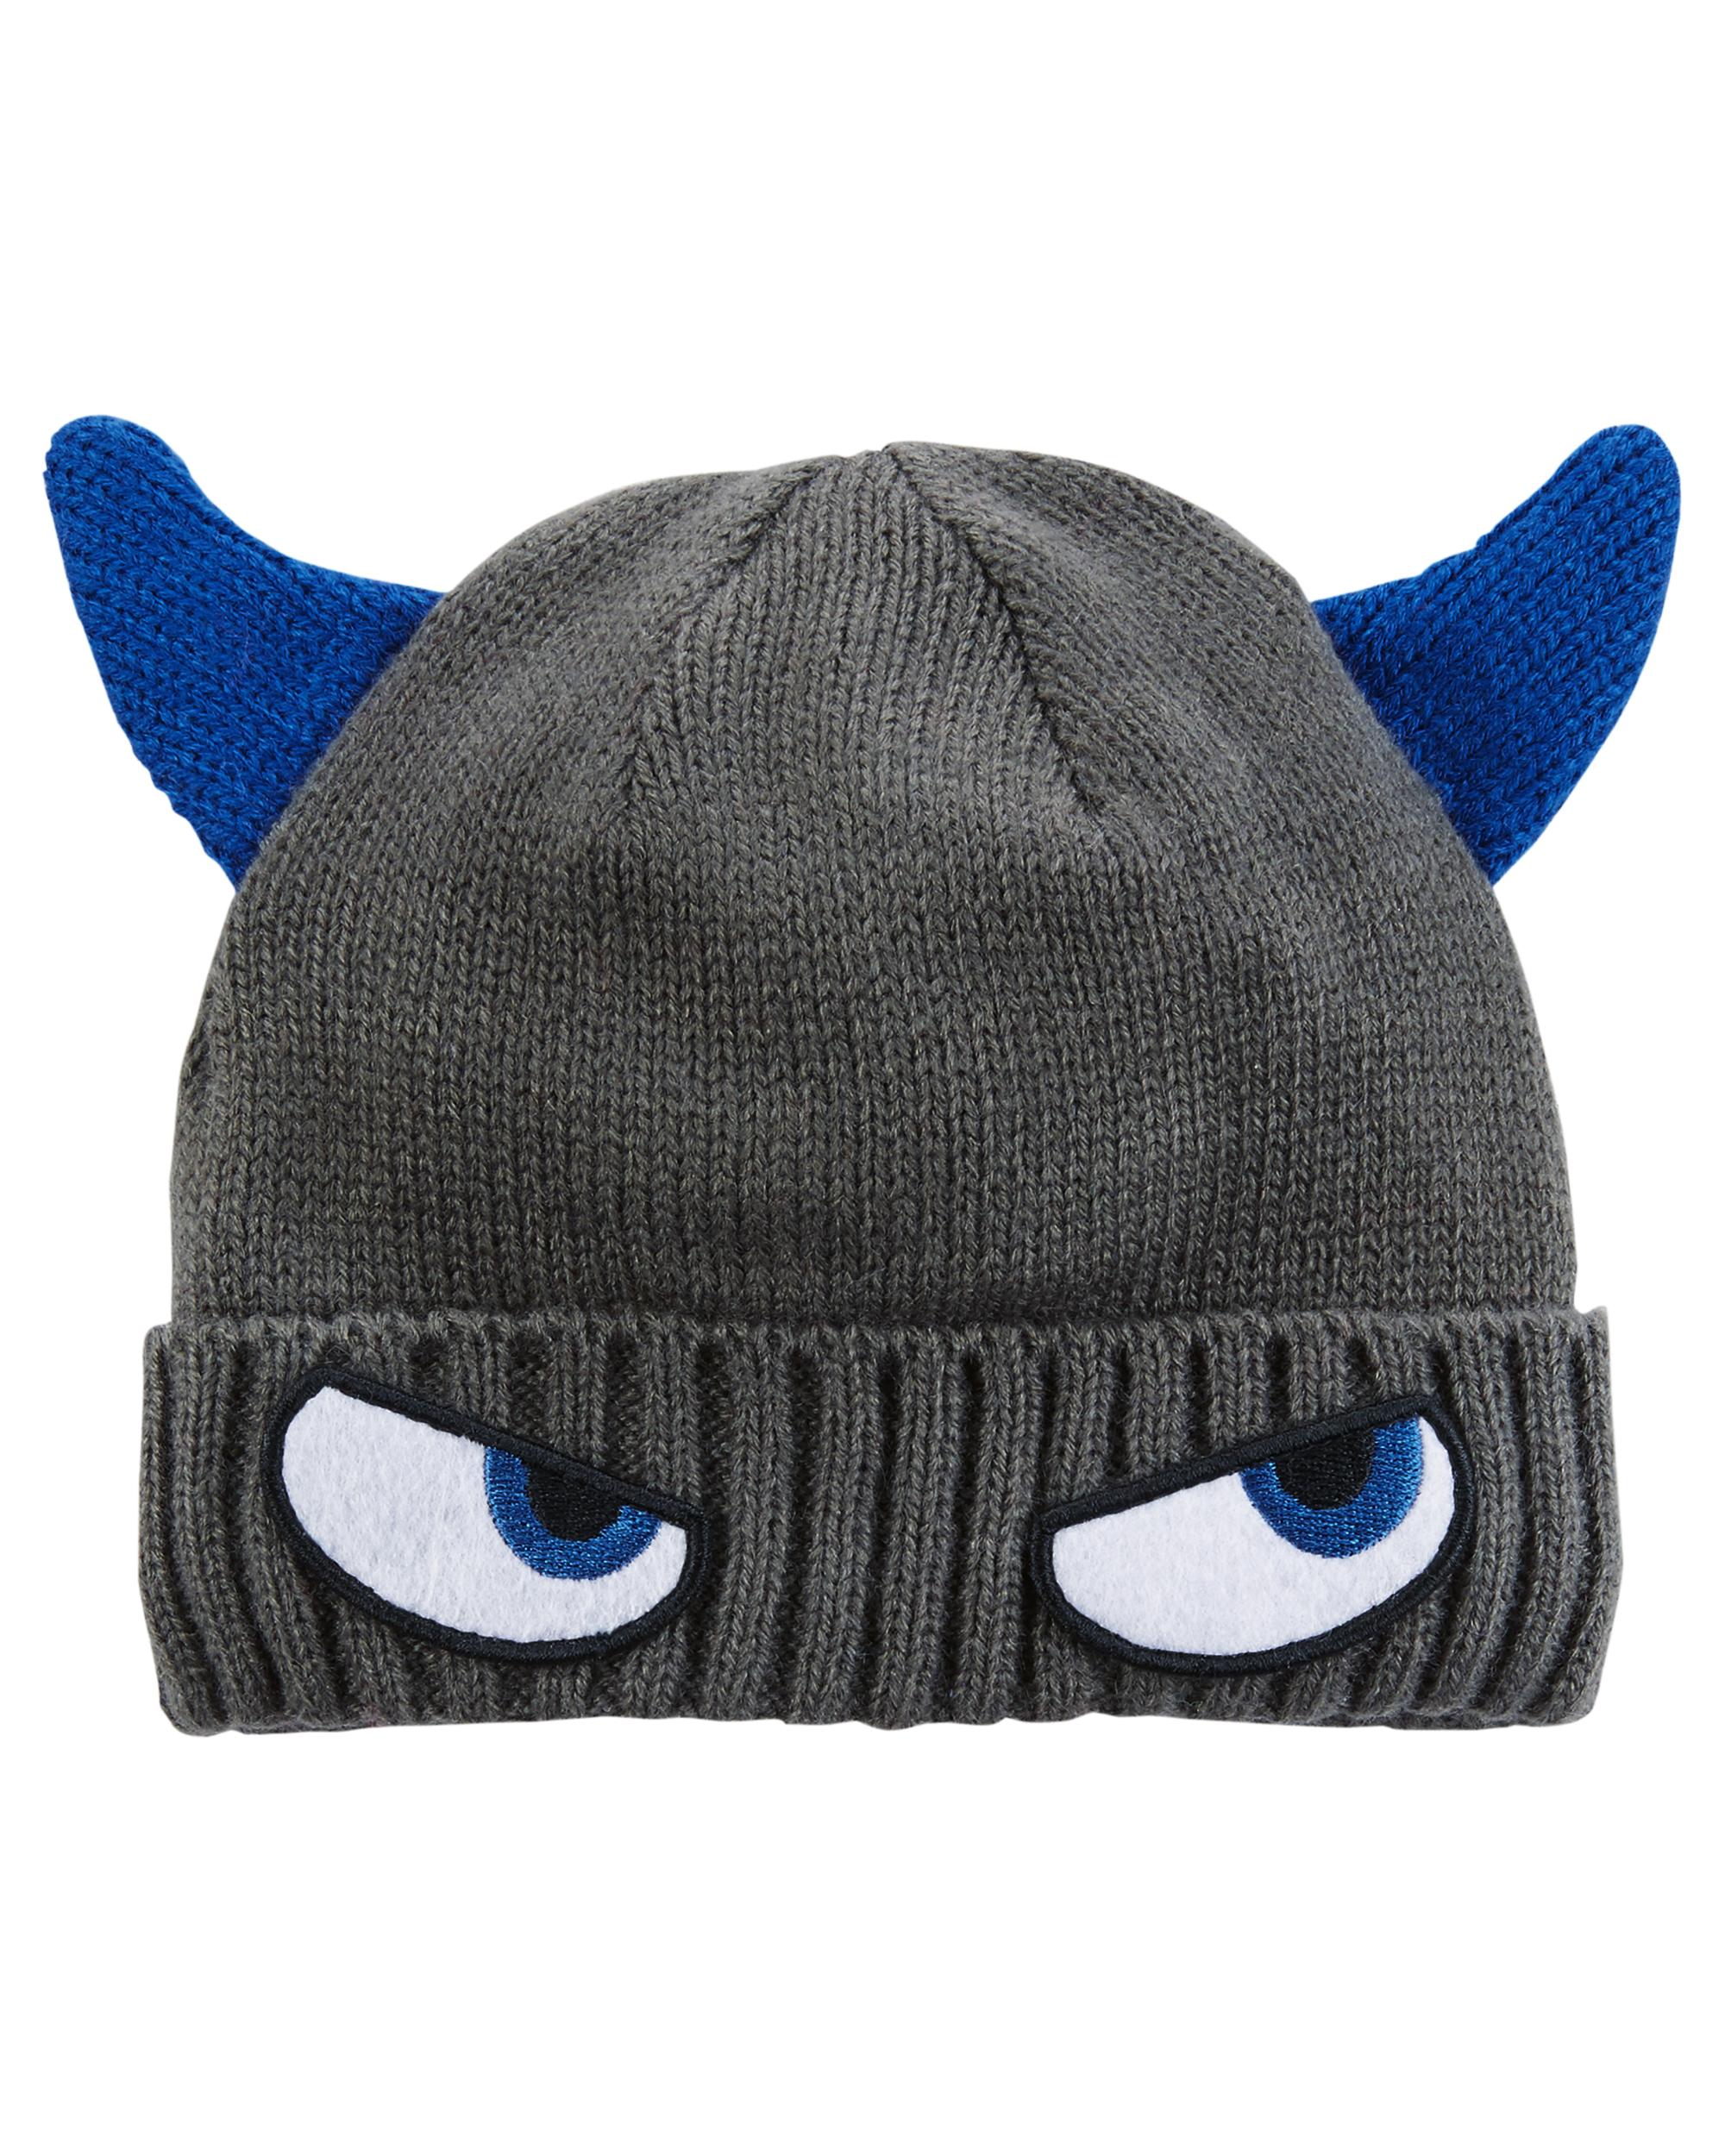 99e6f3080 Knit Character Hat | carters.com